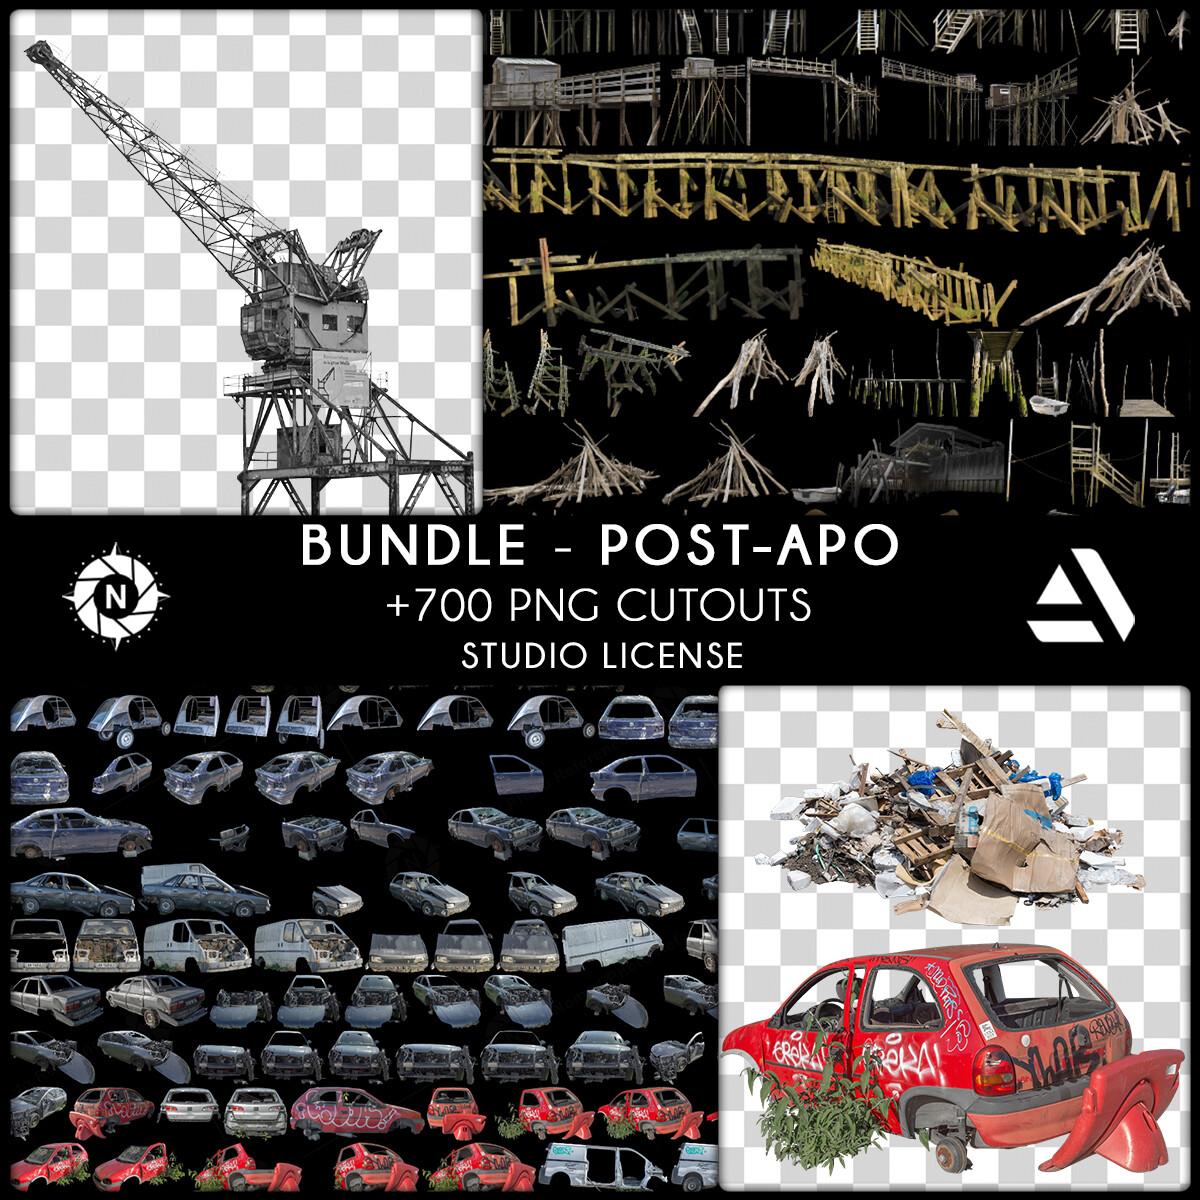 Bundle PNG Photo Packs: Post-Apocalyptic - Studio License  https://www.artstation.com/a/6276955